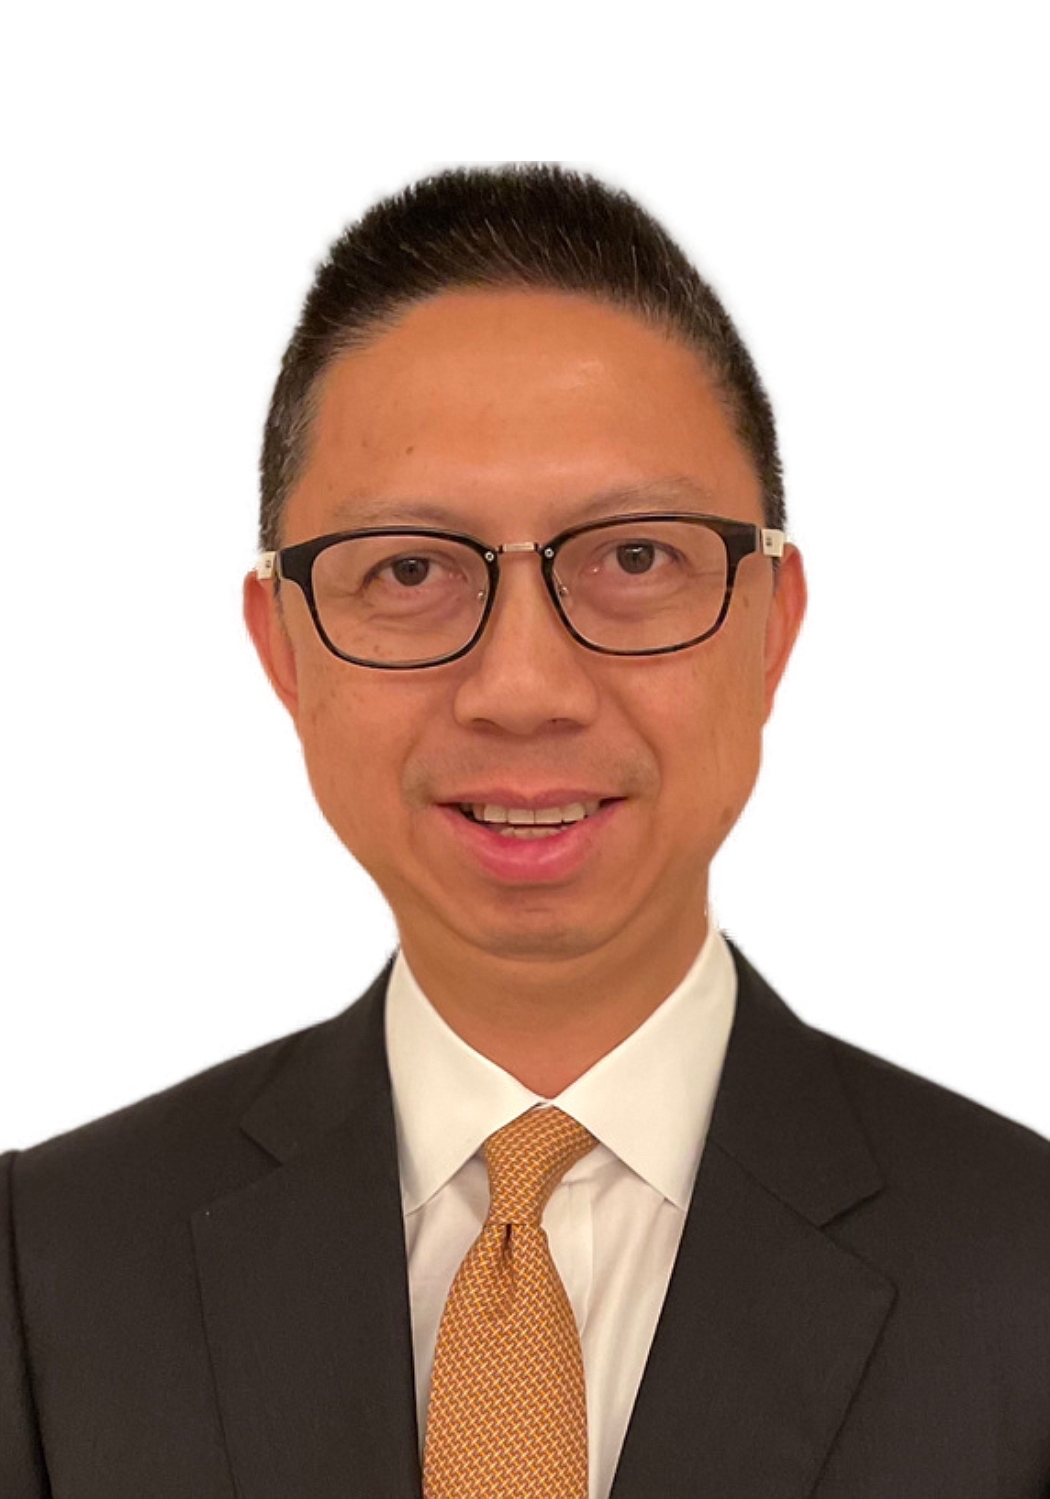 et41889130359351 - 香港交易所委任集团总法律顾问.-香港上市